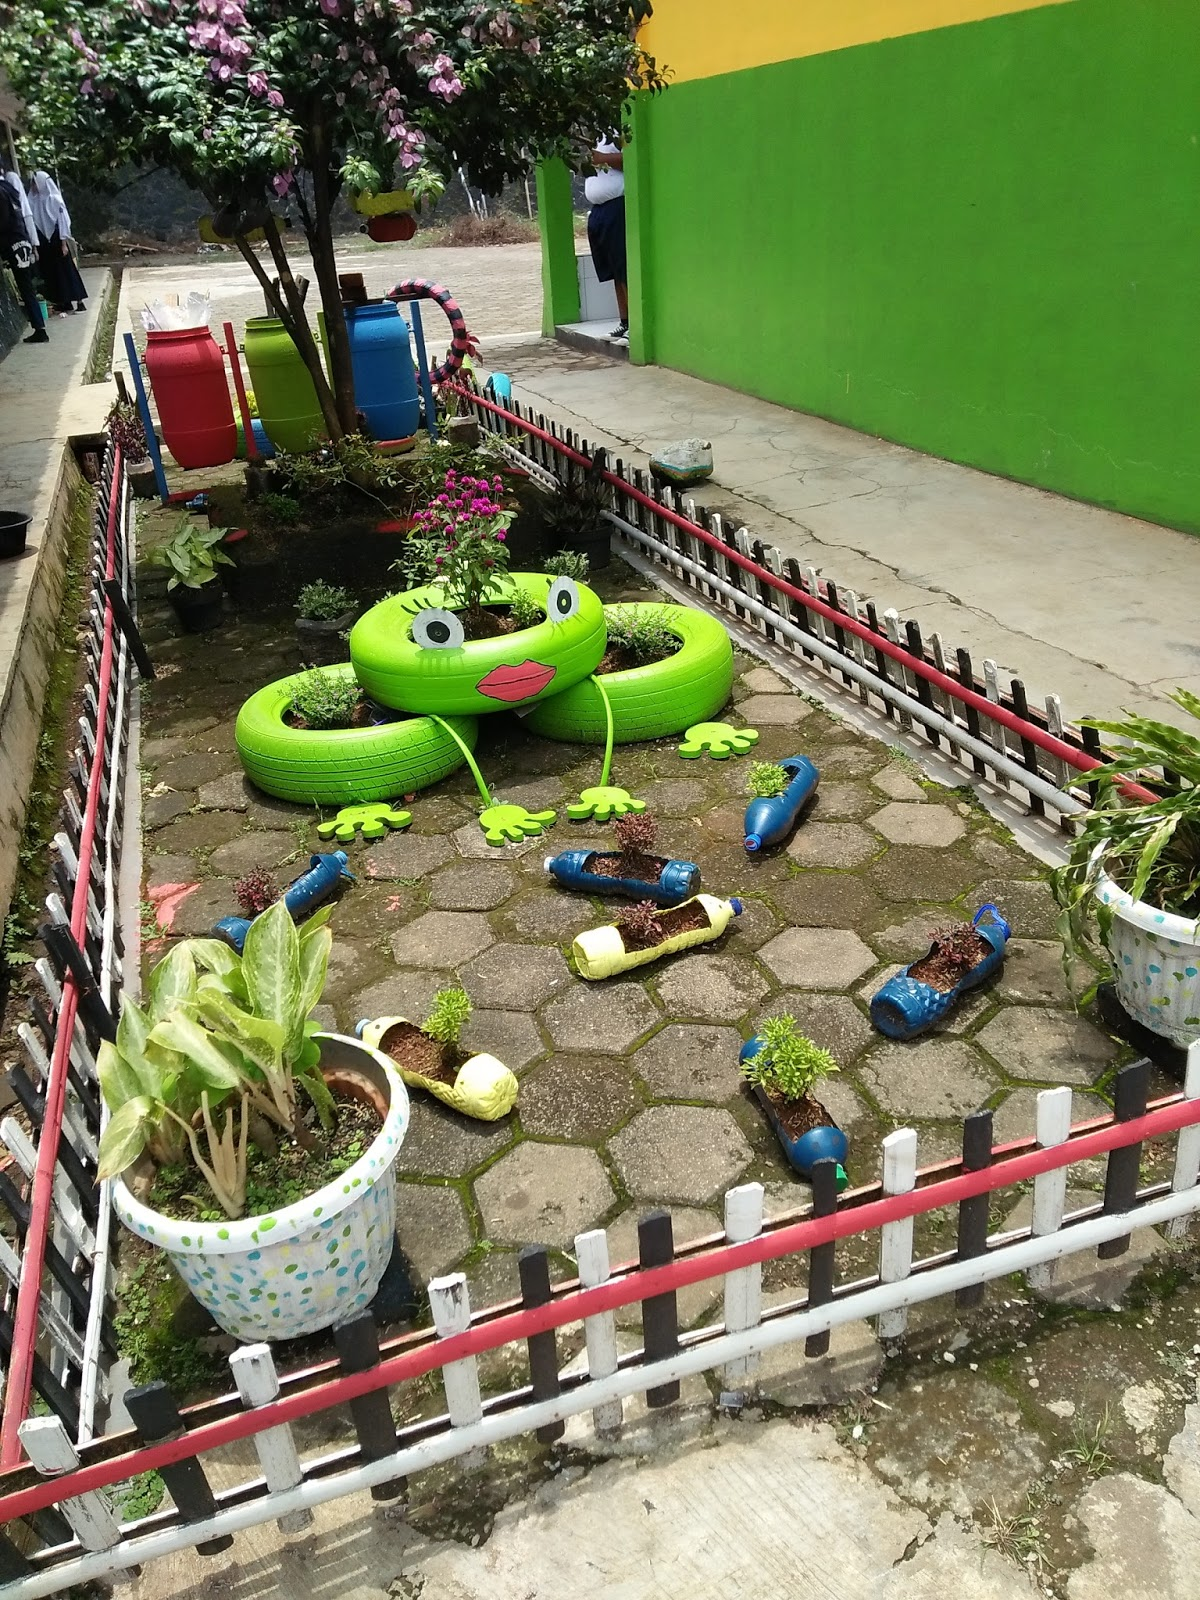 Taman Sekolah Adiwiyata : taman, sekolah, adiwiyata, Contoh, Taman, Sekolah, Adiwiyata, Nusagates